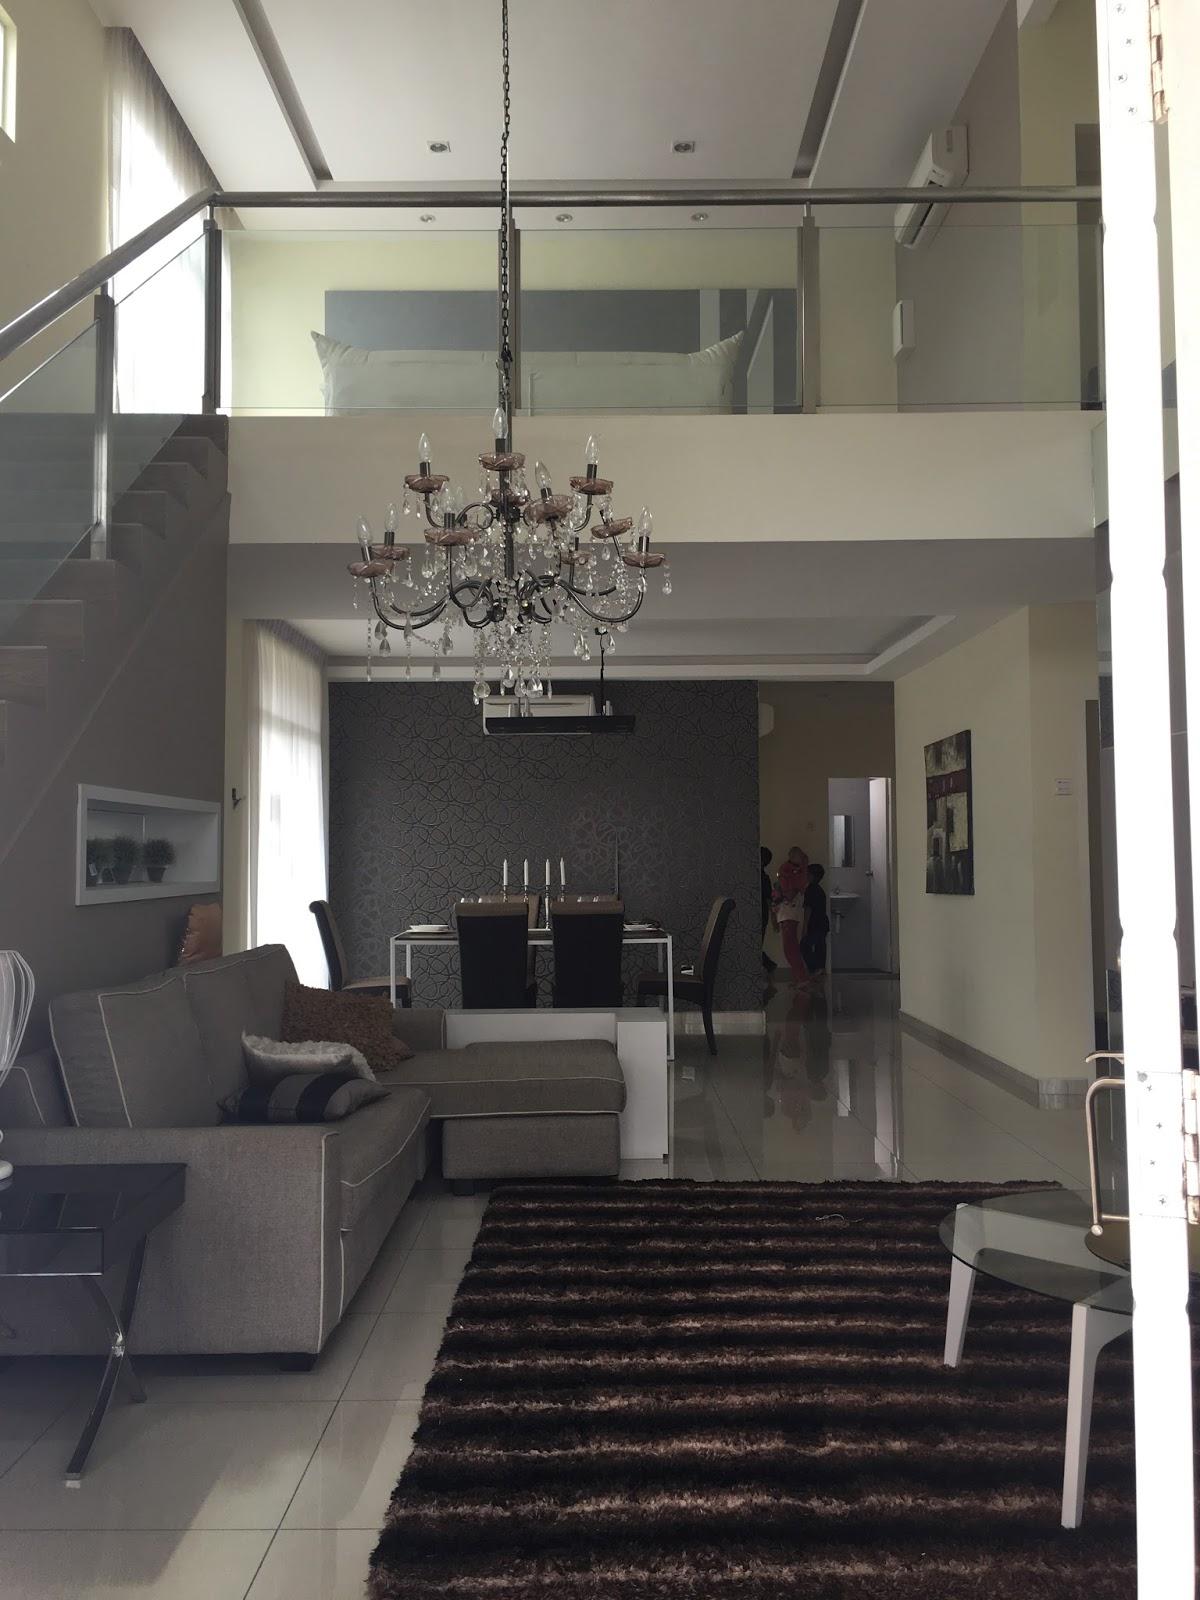 Ruang Tamu Keluarga Atas Lebih Berciri Terbuka Rumah Asal Tangga Adalah Besi Tapi Untuk Contoh Nie Dah Reno Buat Gl